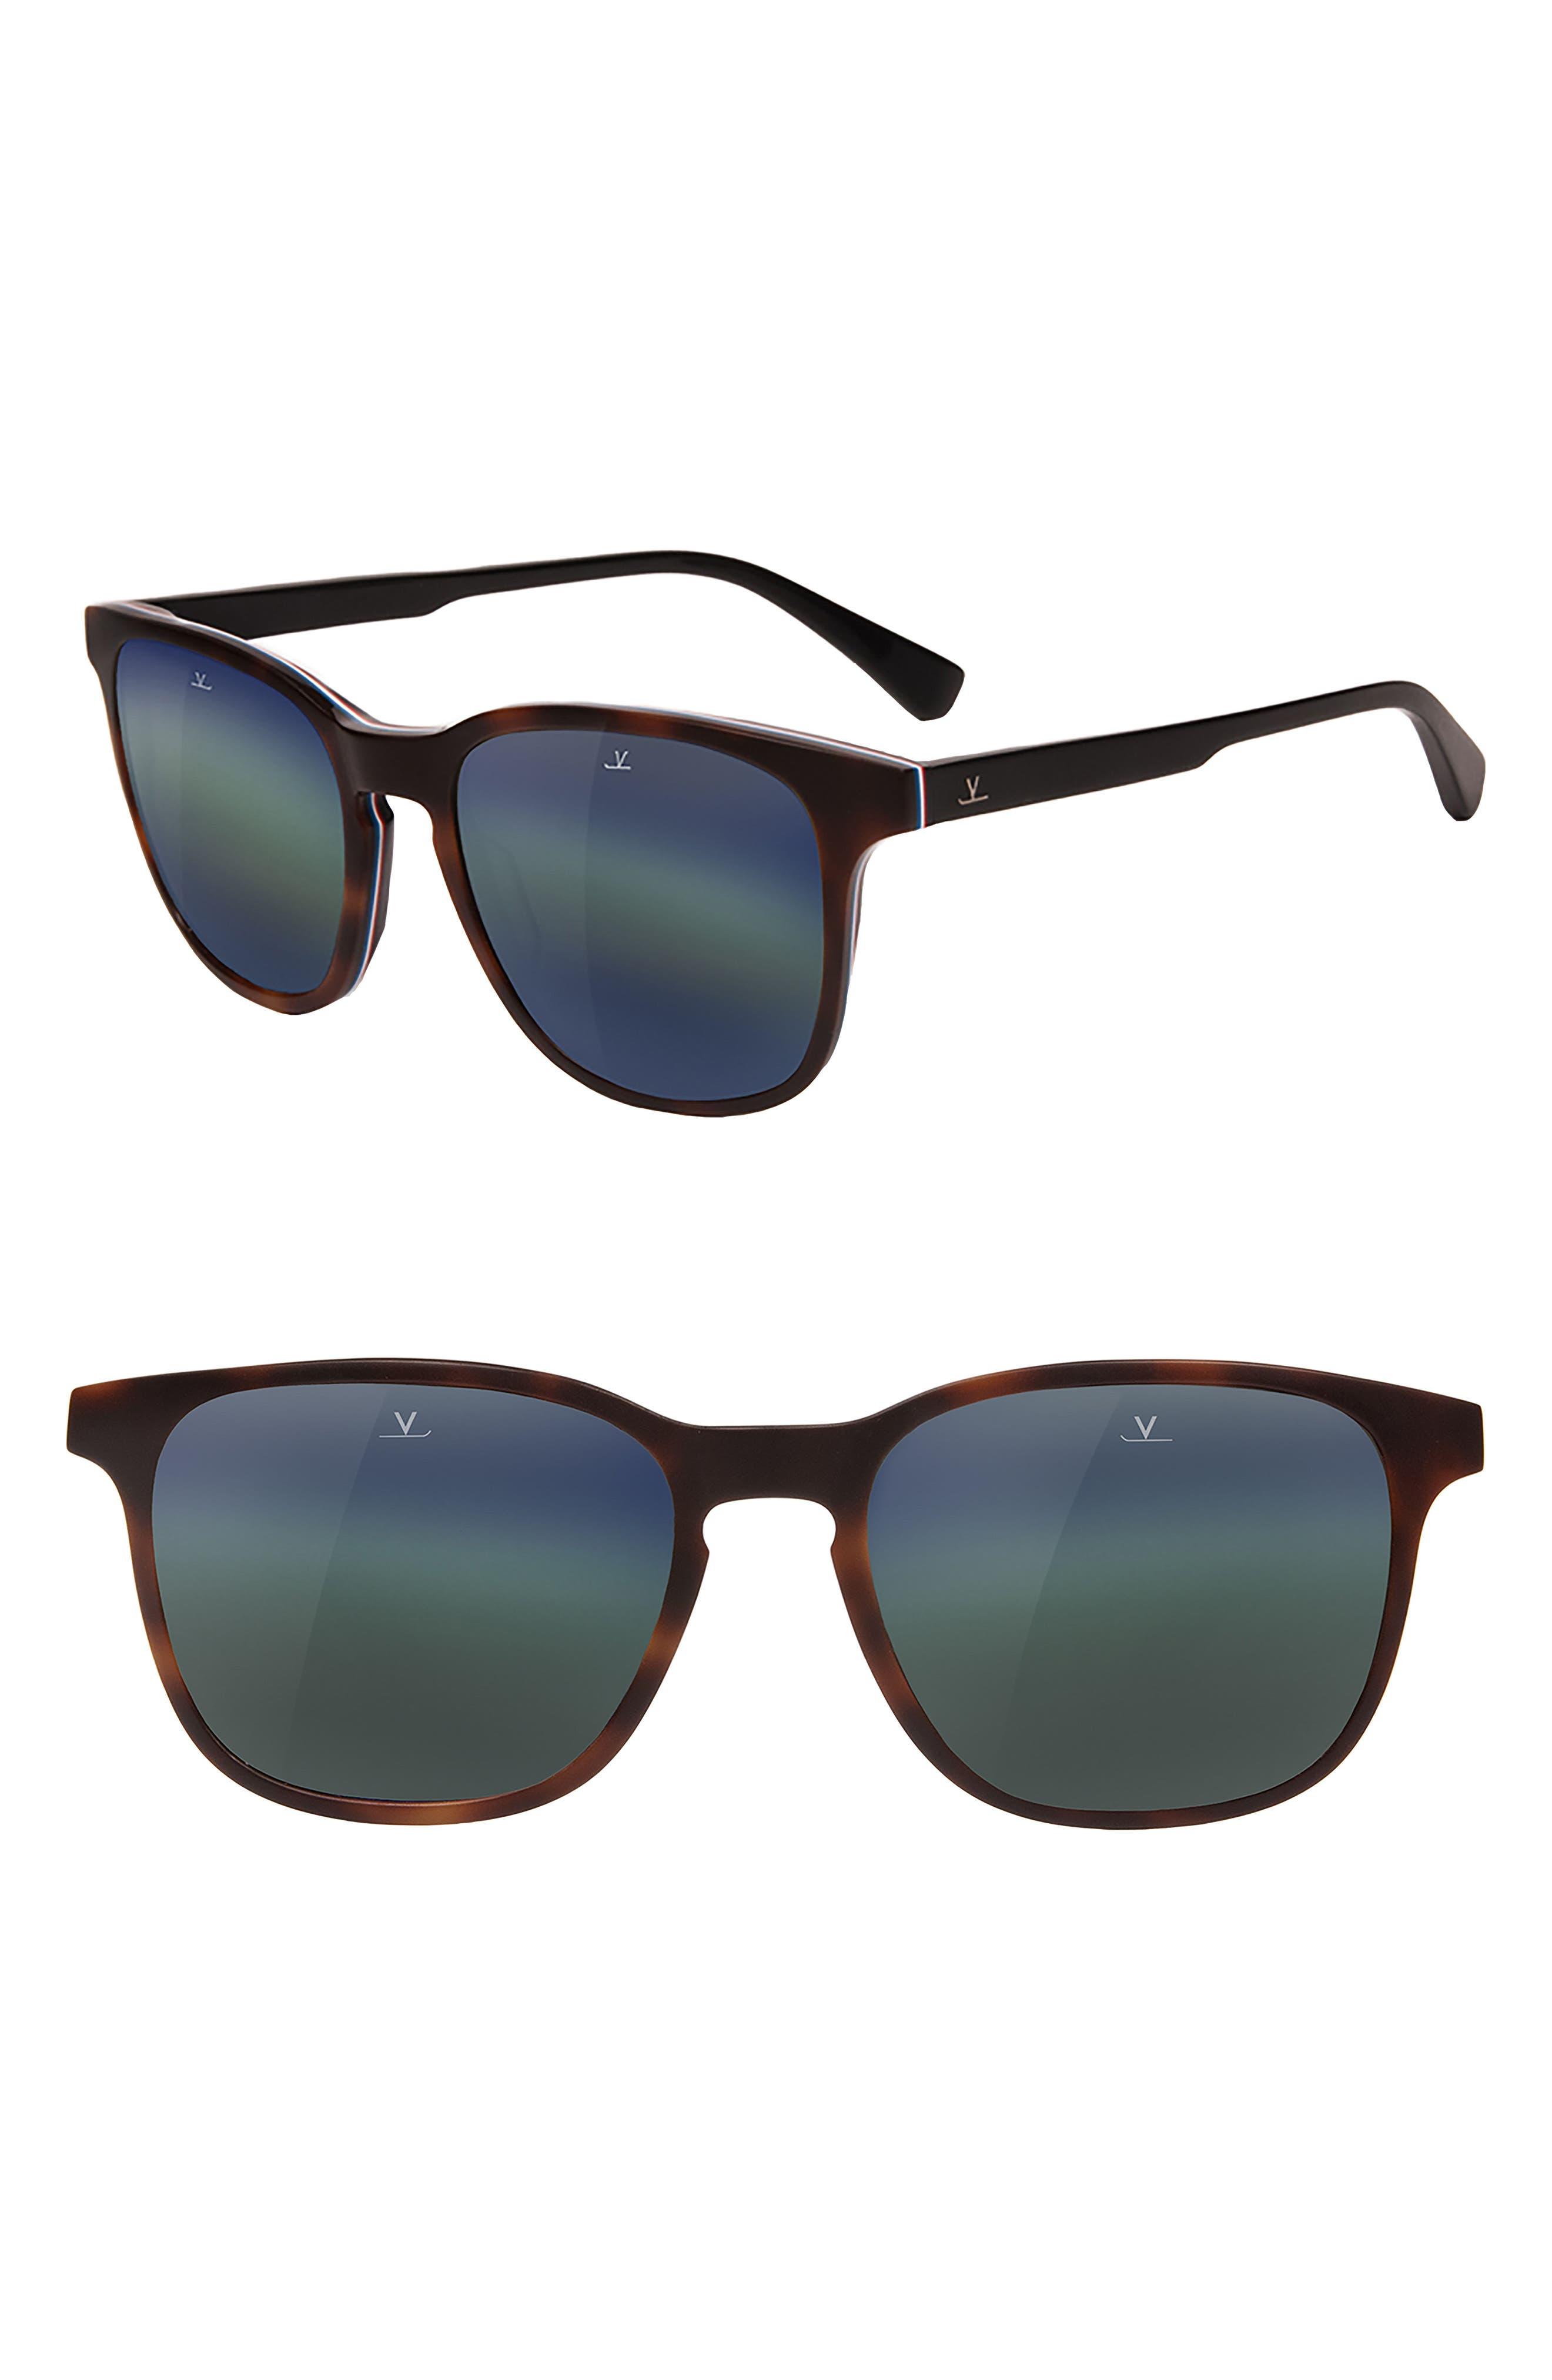 District Medium 53mm Sunglasses,                         Main,                         color, 203